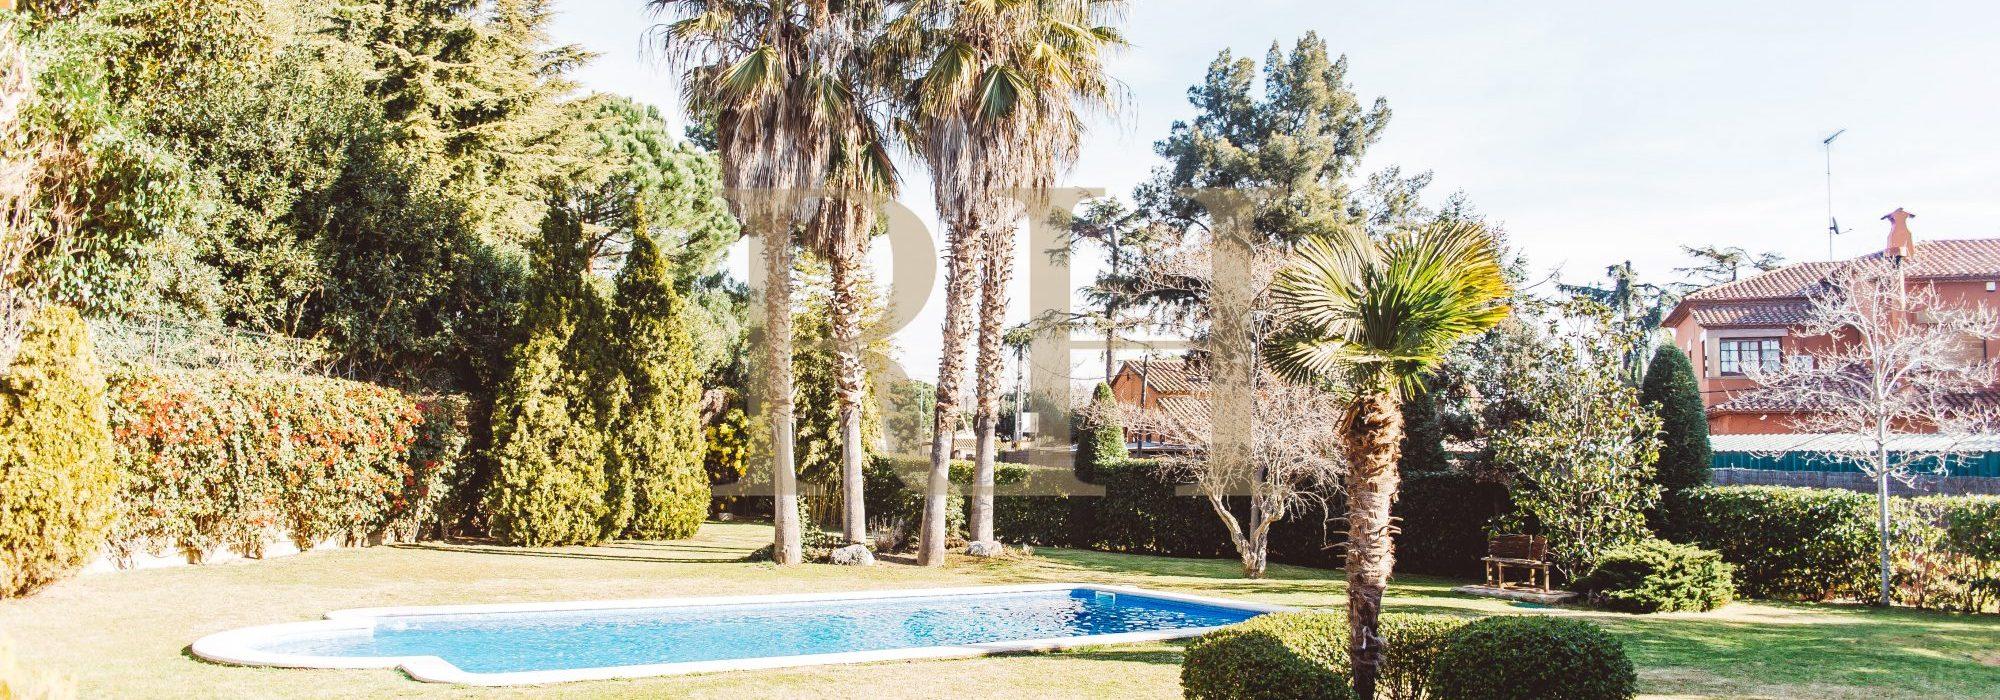 Espectacular Chalet con piscina y parcela grande en Sant Andreu de Llavaneres